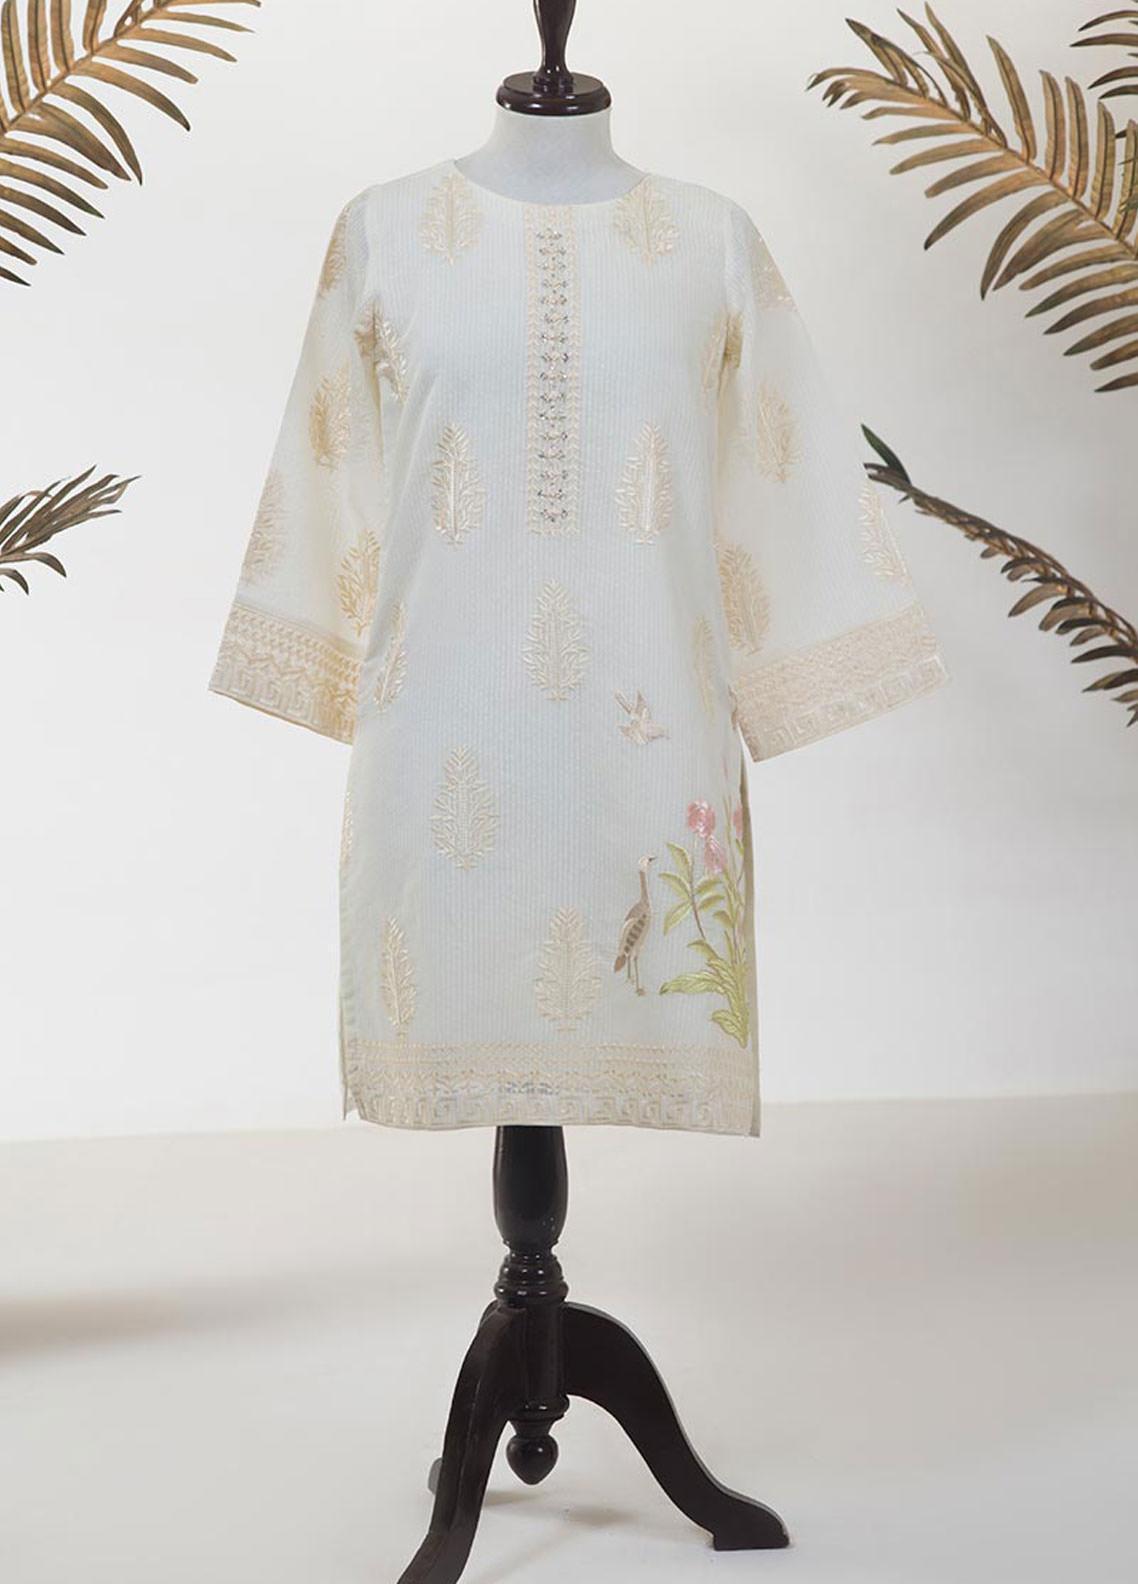 Dhanak Embroidered Jacquard Stitched Kurti DA-1210 OFF WHITE